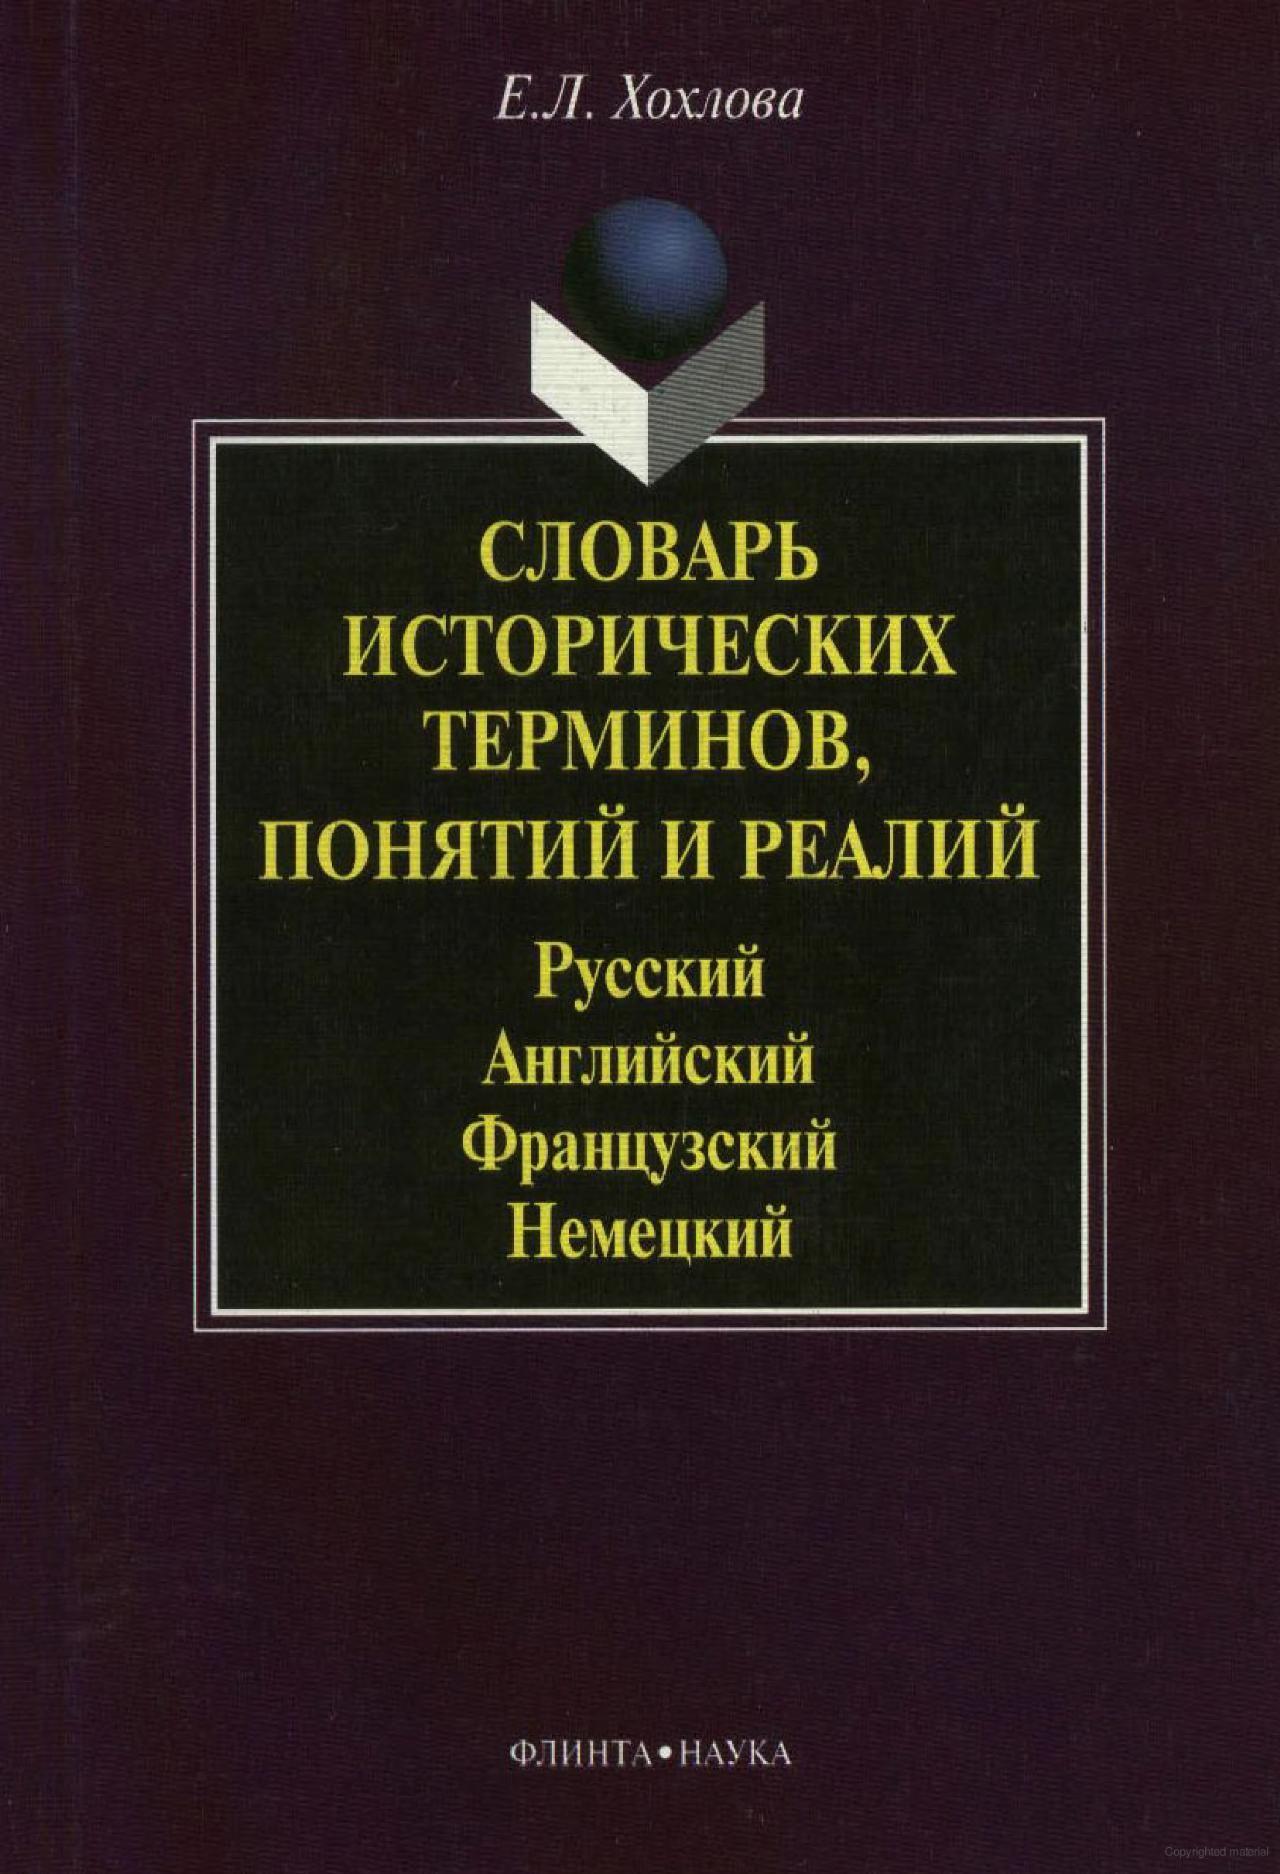 Slovar Istoricheskih Terminov Ponyatij I Realij Russkij Anglijskij Francuzskij Nemeckij Anglijskij Nemeckij Inostrannye Yazyki